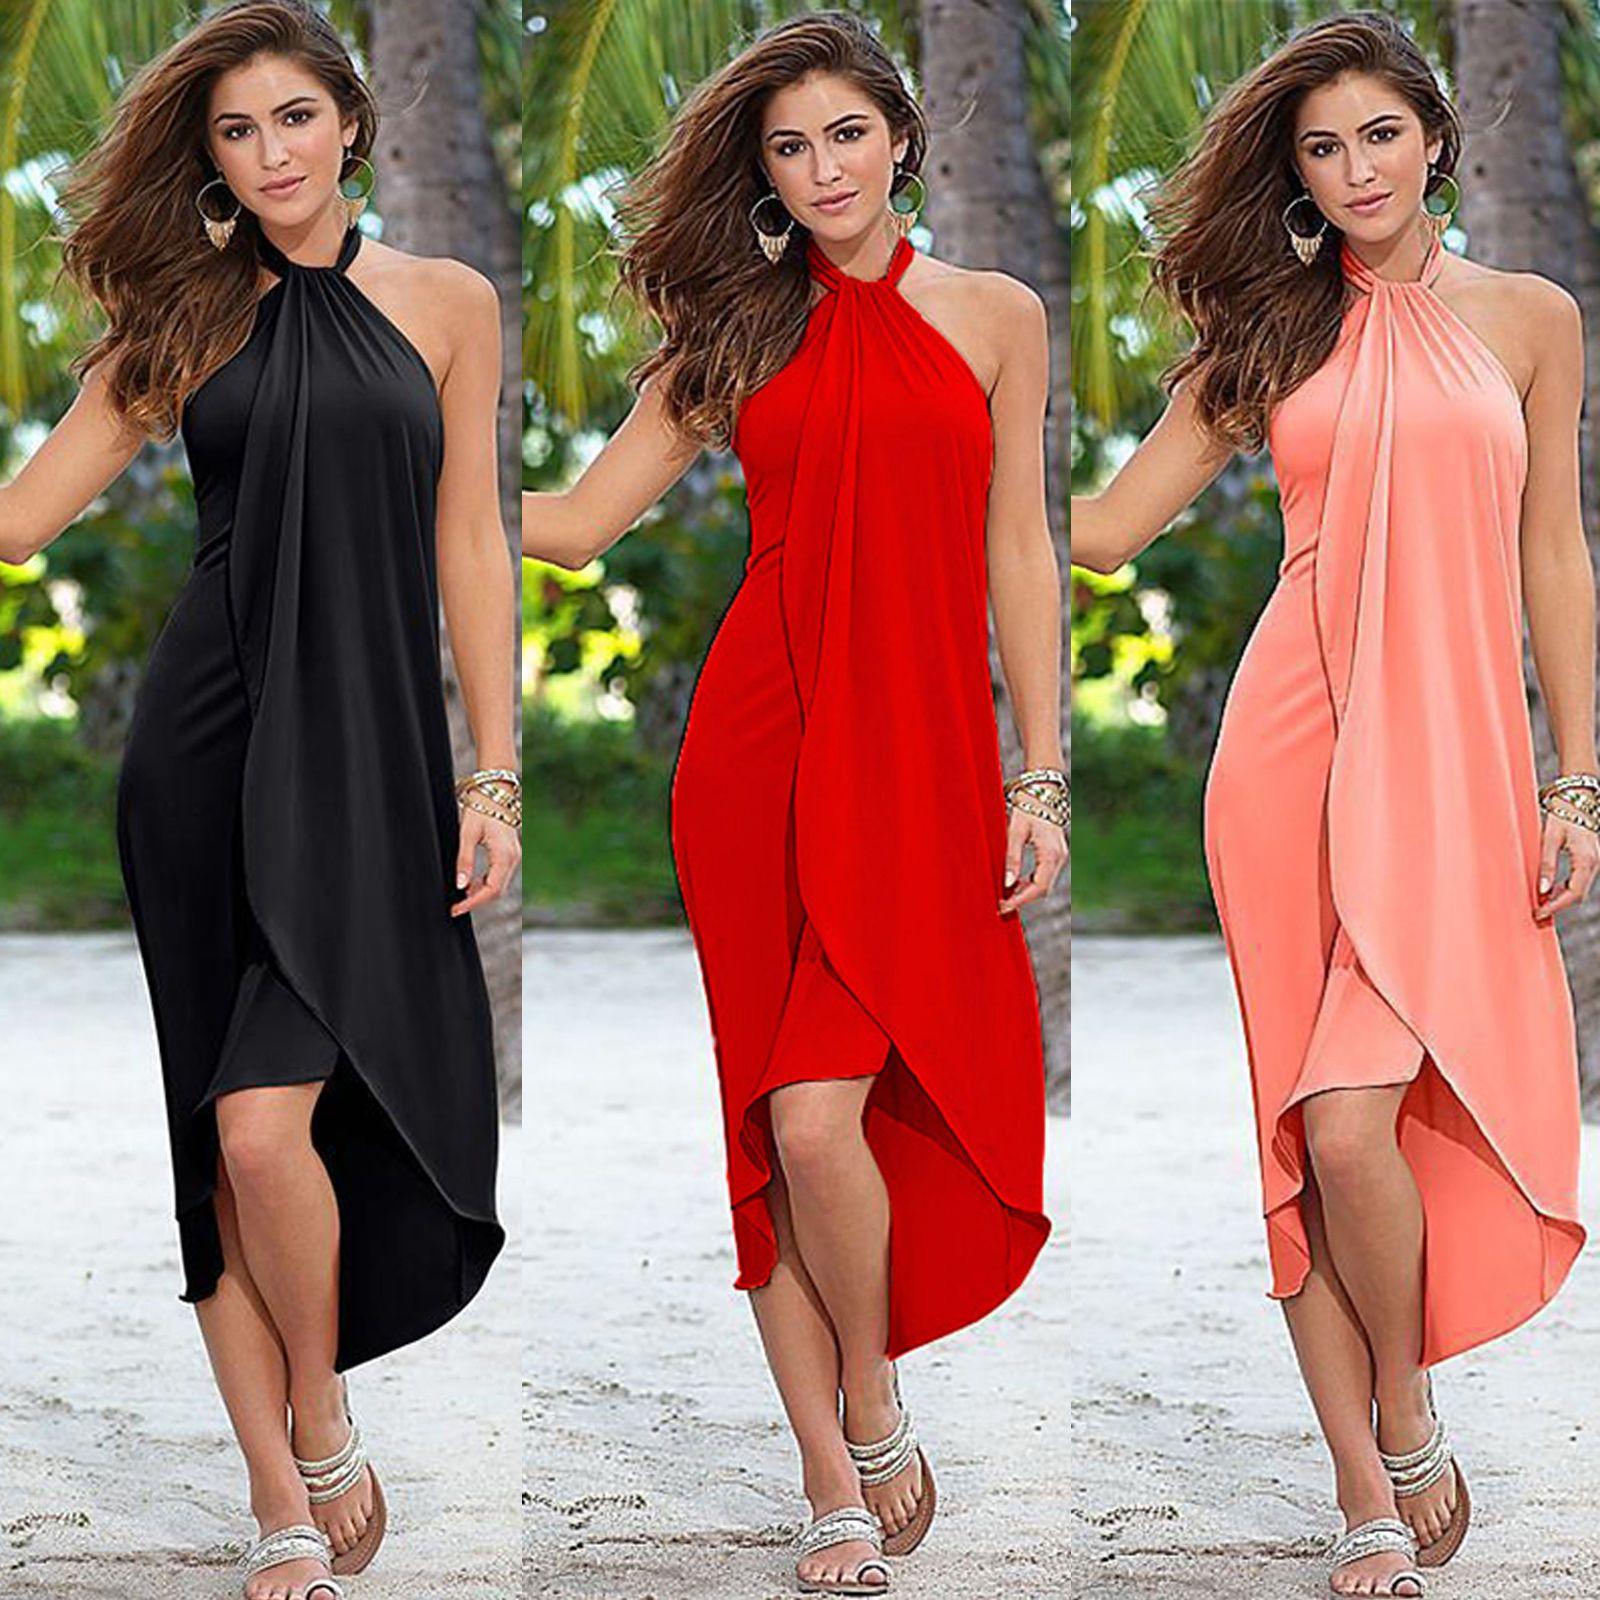 cac8172b274 Women Summer Boho Long Maxi Dresses Evening Cocktail Party Casual Beach  Sundress